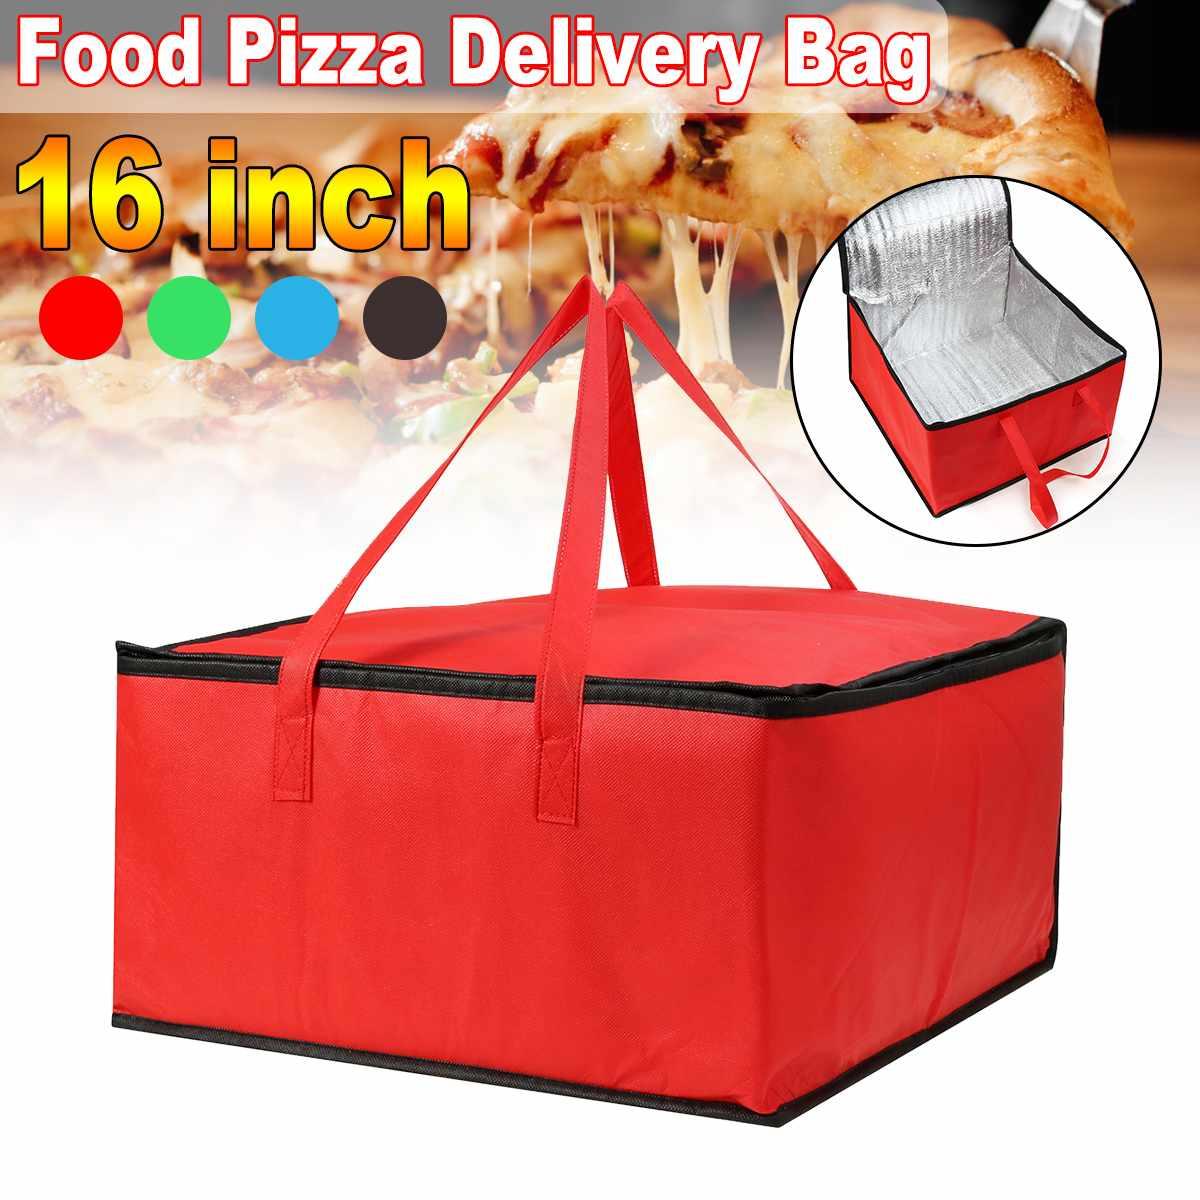 "16 ""isolado saco refrigerador isolamento saco dobrável piquenique portátil bloco de gelo comida saco térmico saco de entrega de alimentos saco de pizza|Bolsas térmicas|   -"